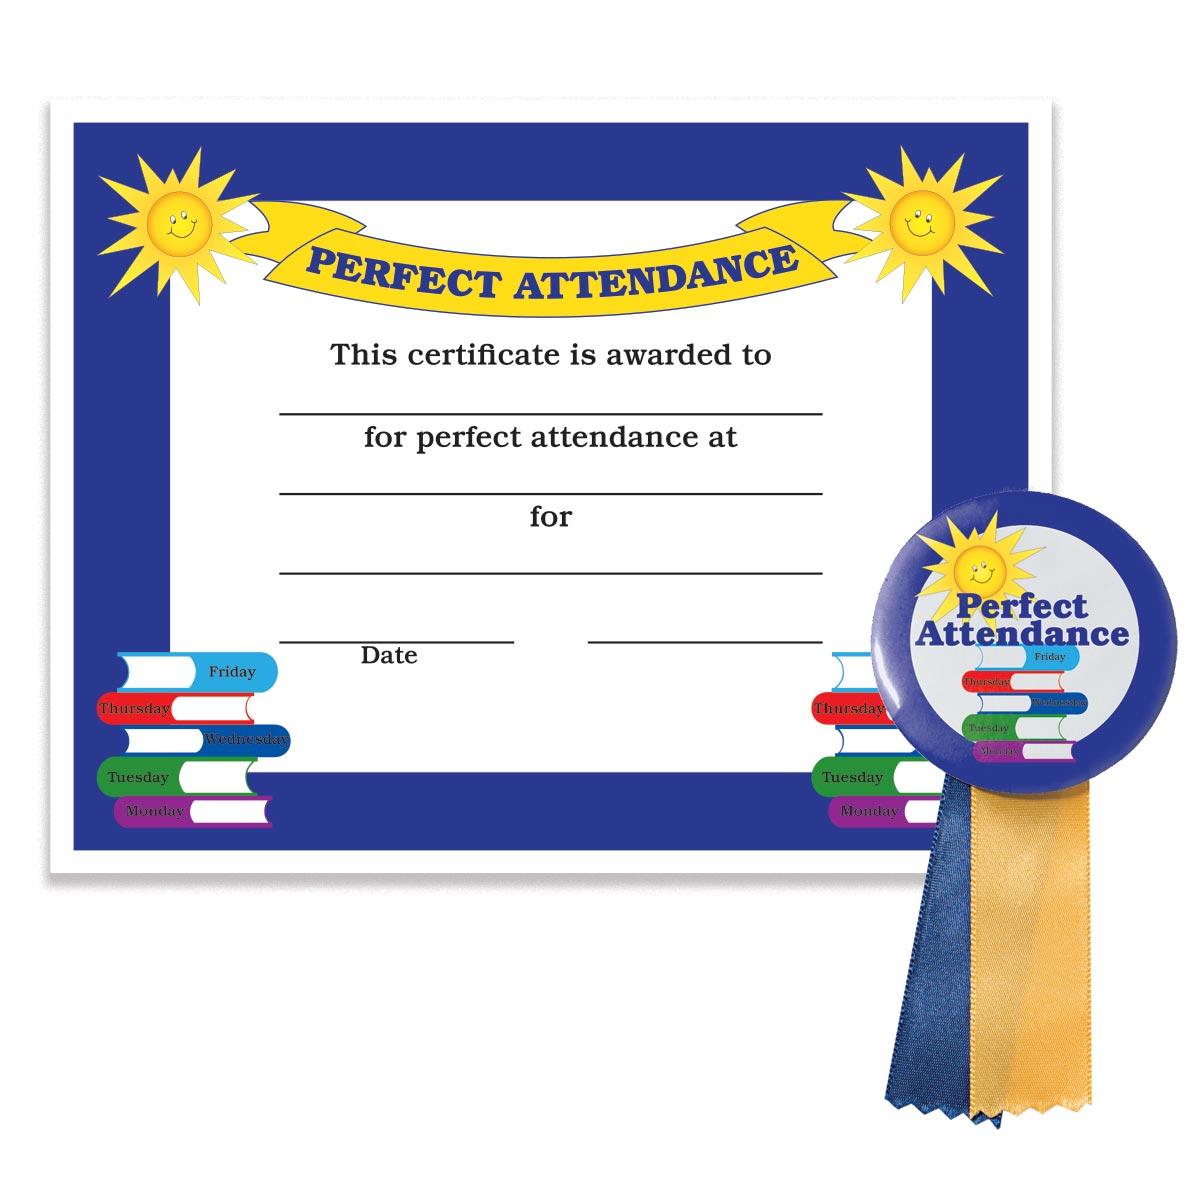 Perfect attendance certificatebutton award set andersons certificatebutton award set perfect attendance 1betcityfo Image collections